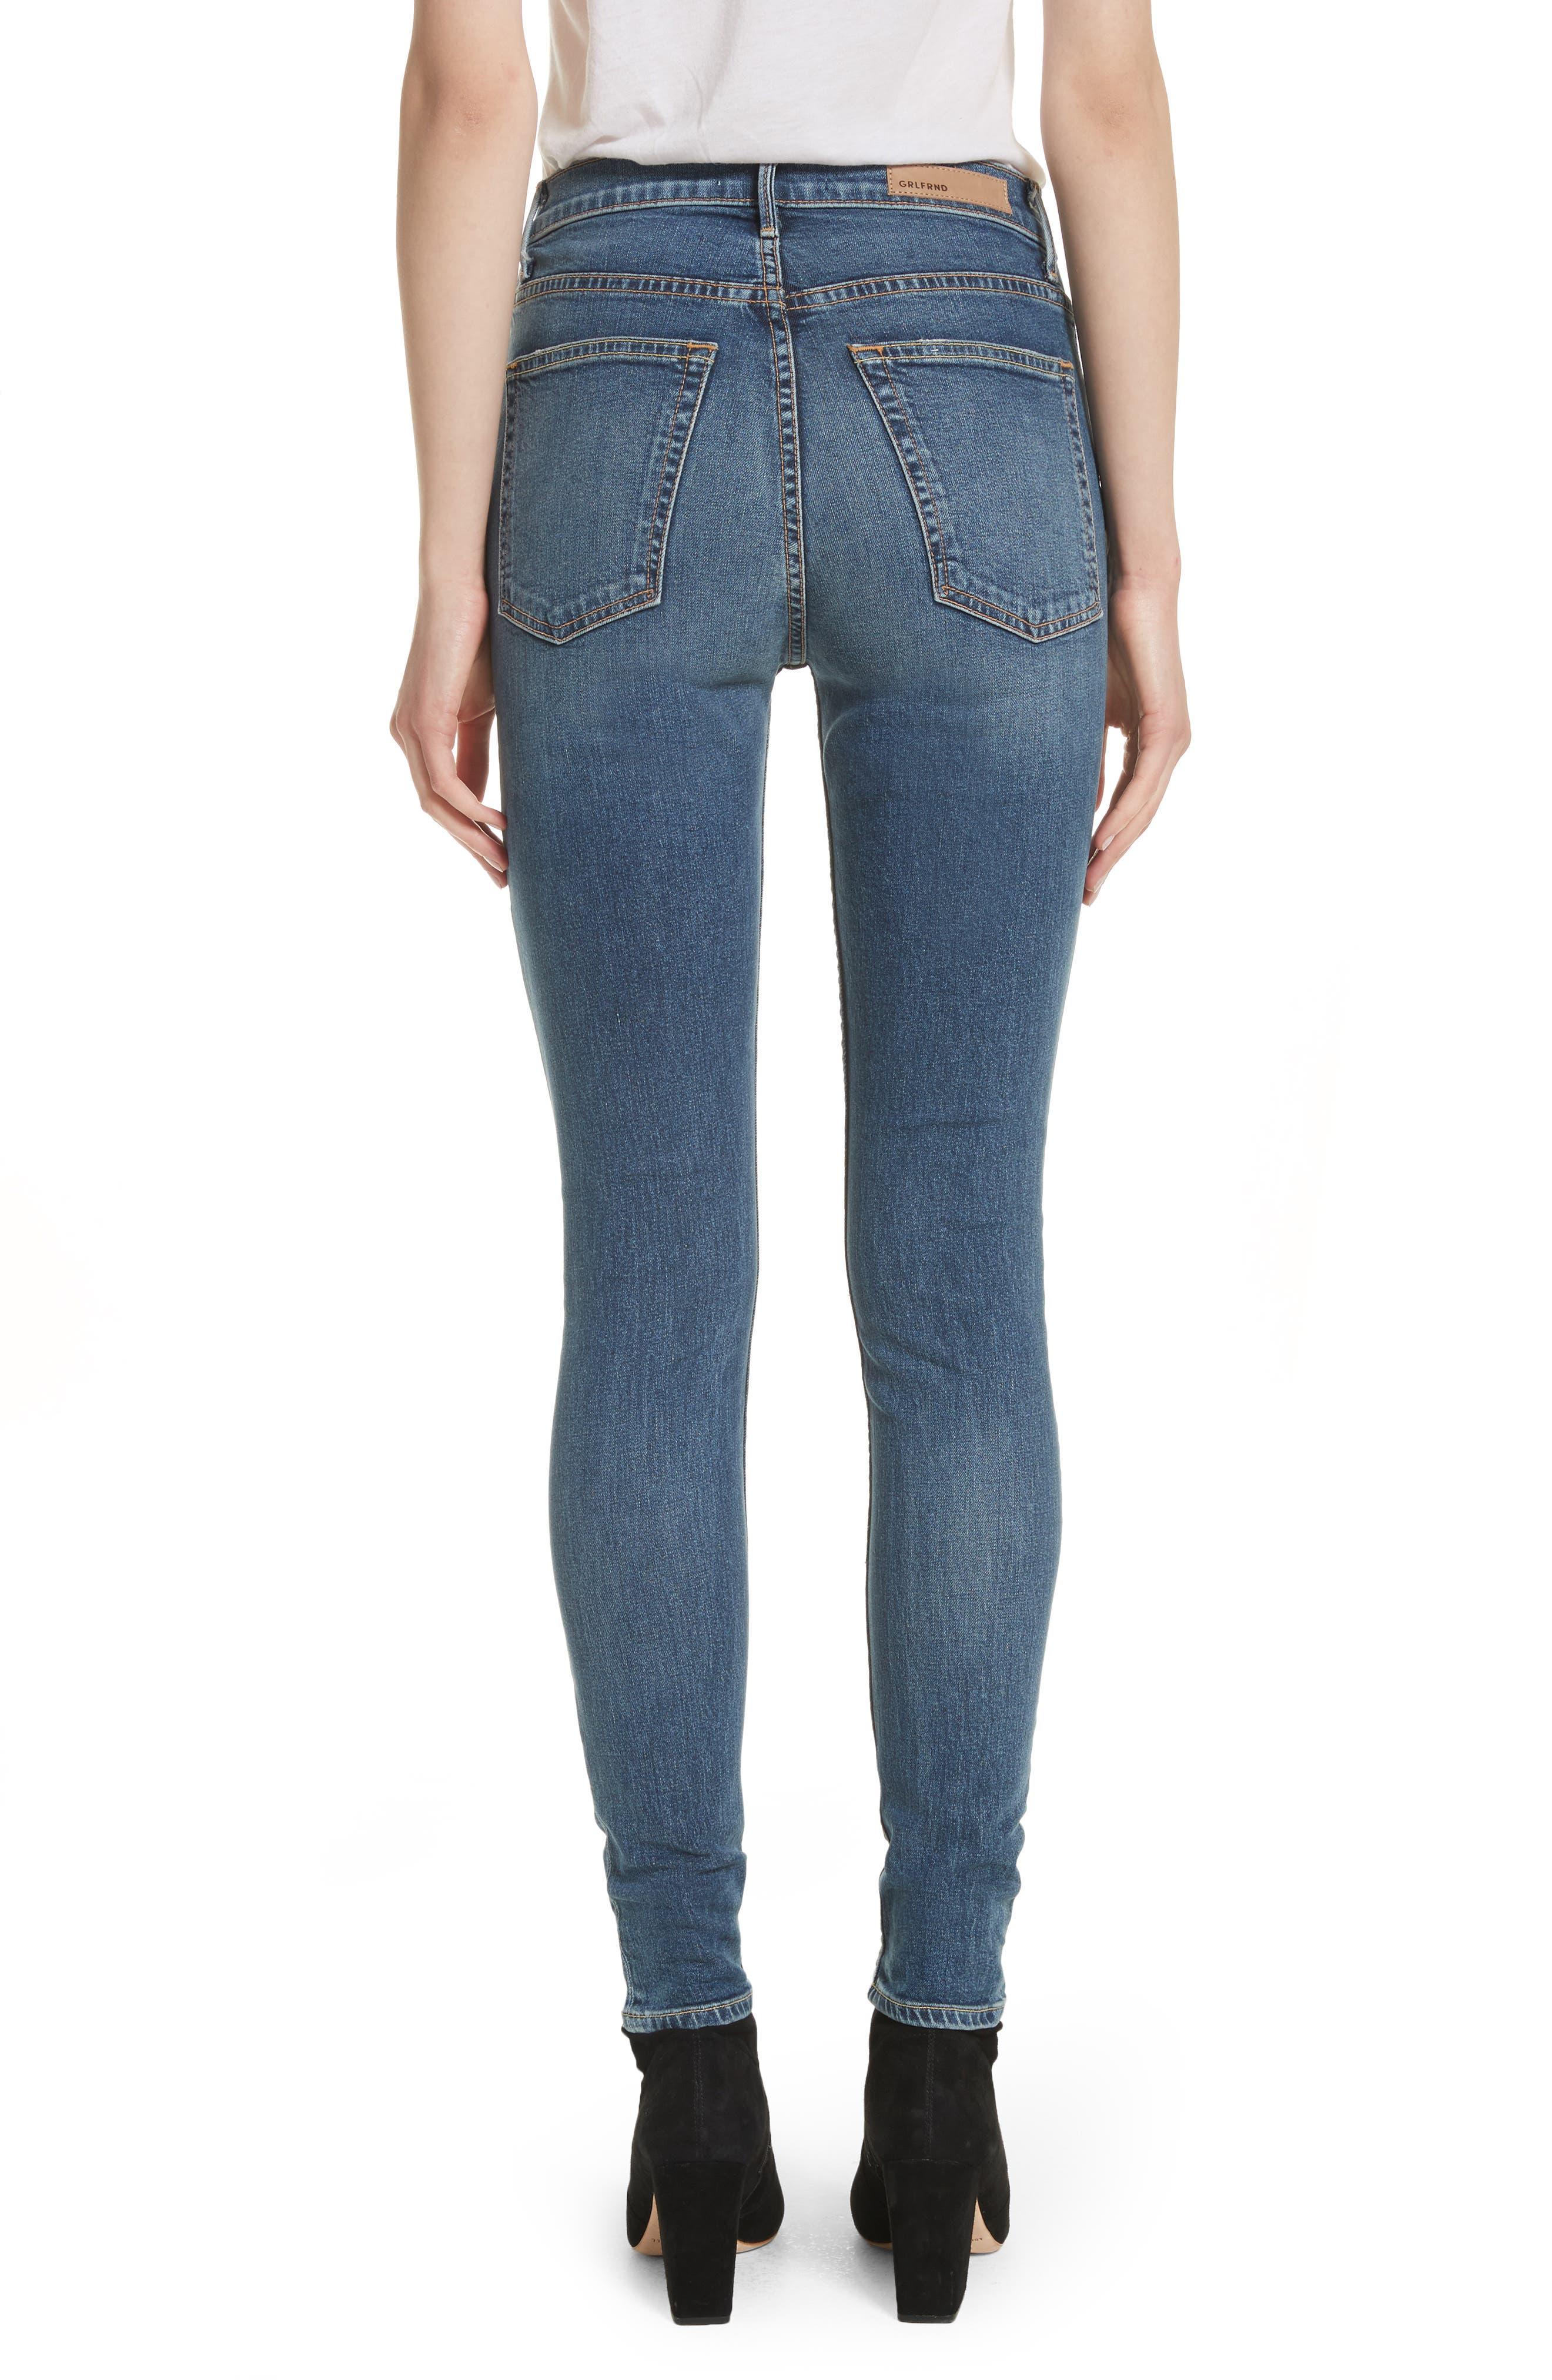 Alternate Image 2  - GRLFRND Kendall Super Stretch High Waist Skinny Jeans (No More Tears)